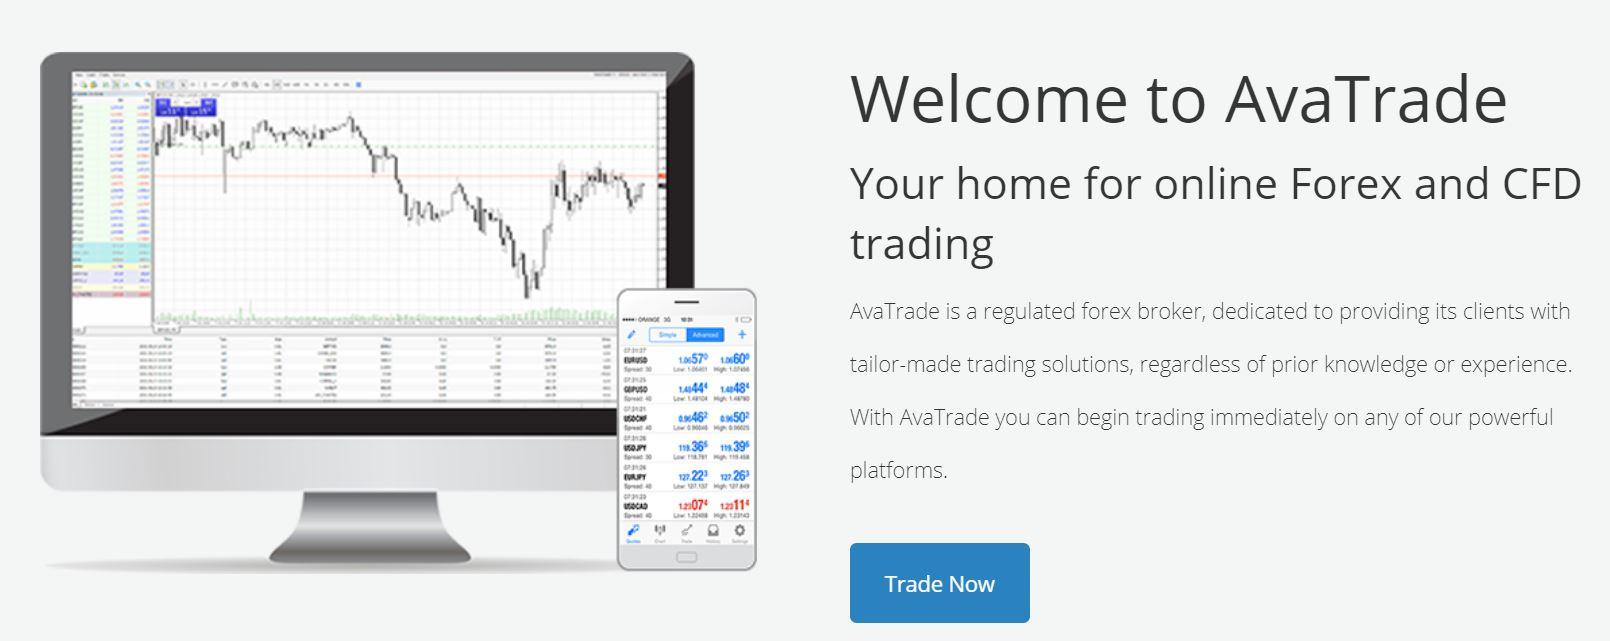 Automated Trading - Autotrading Platforms | AvaTrade